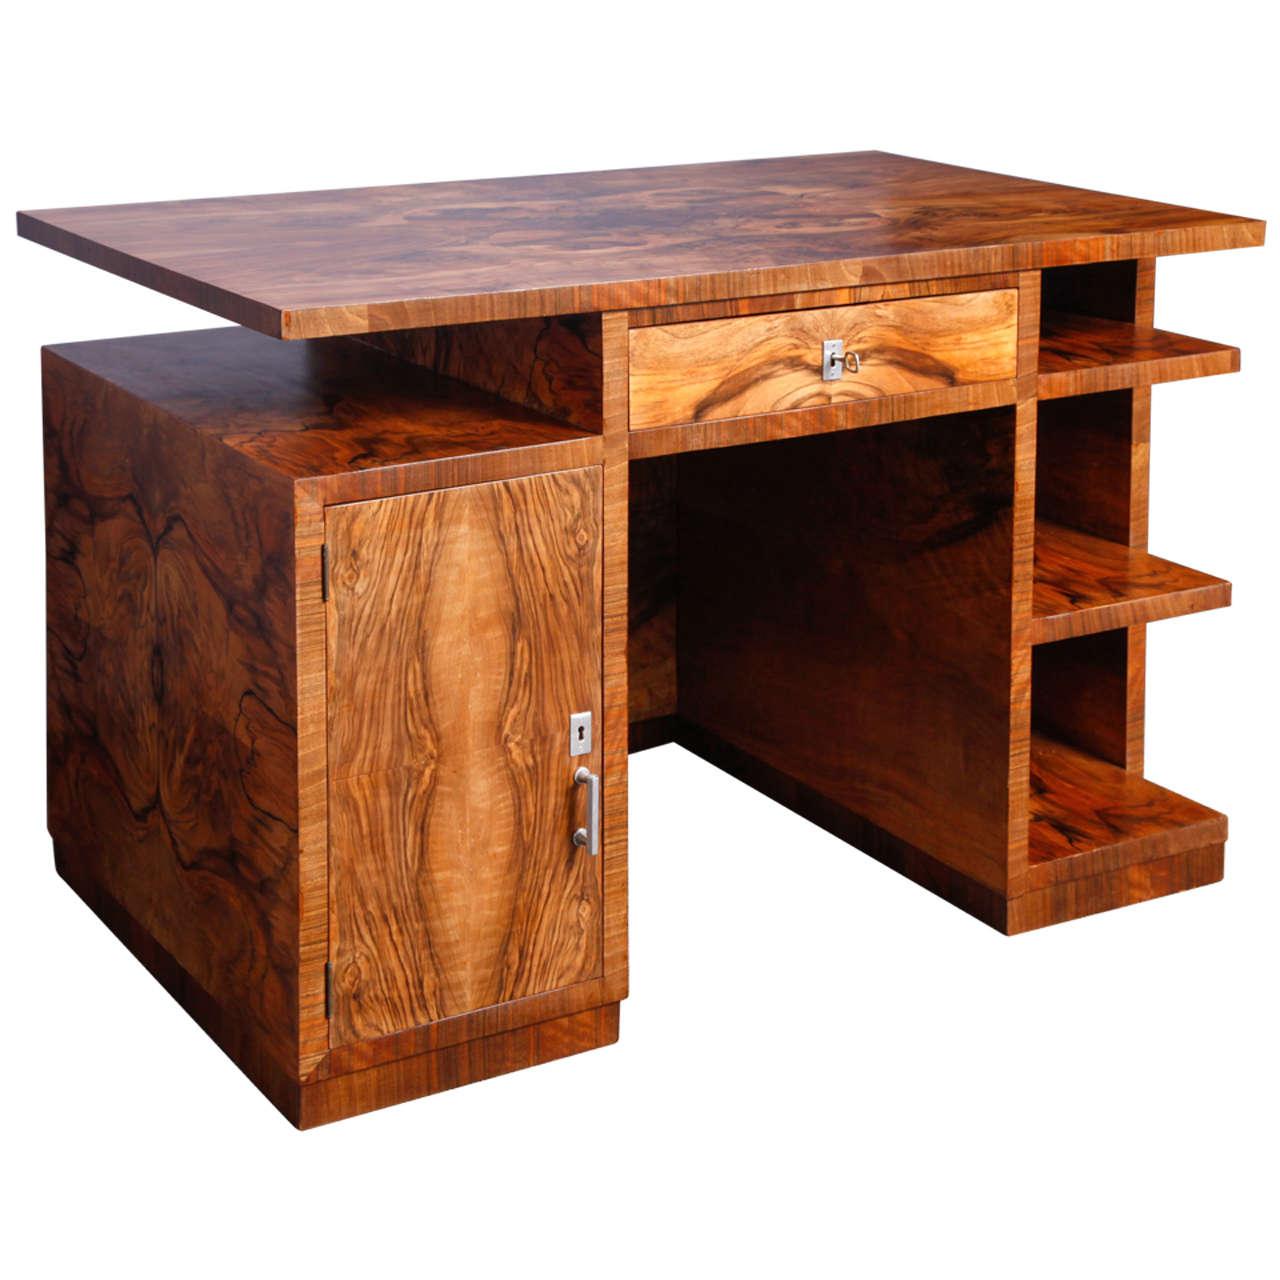 Walnut Art-Deco desk